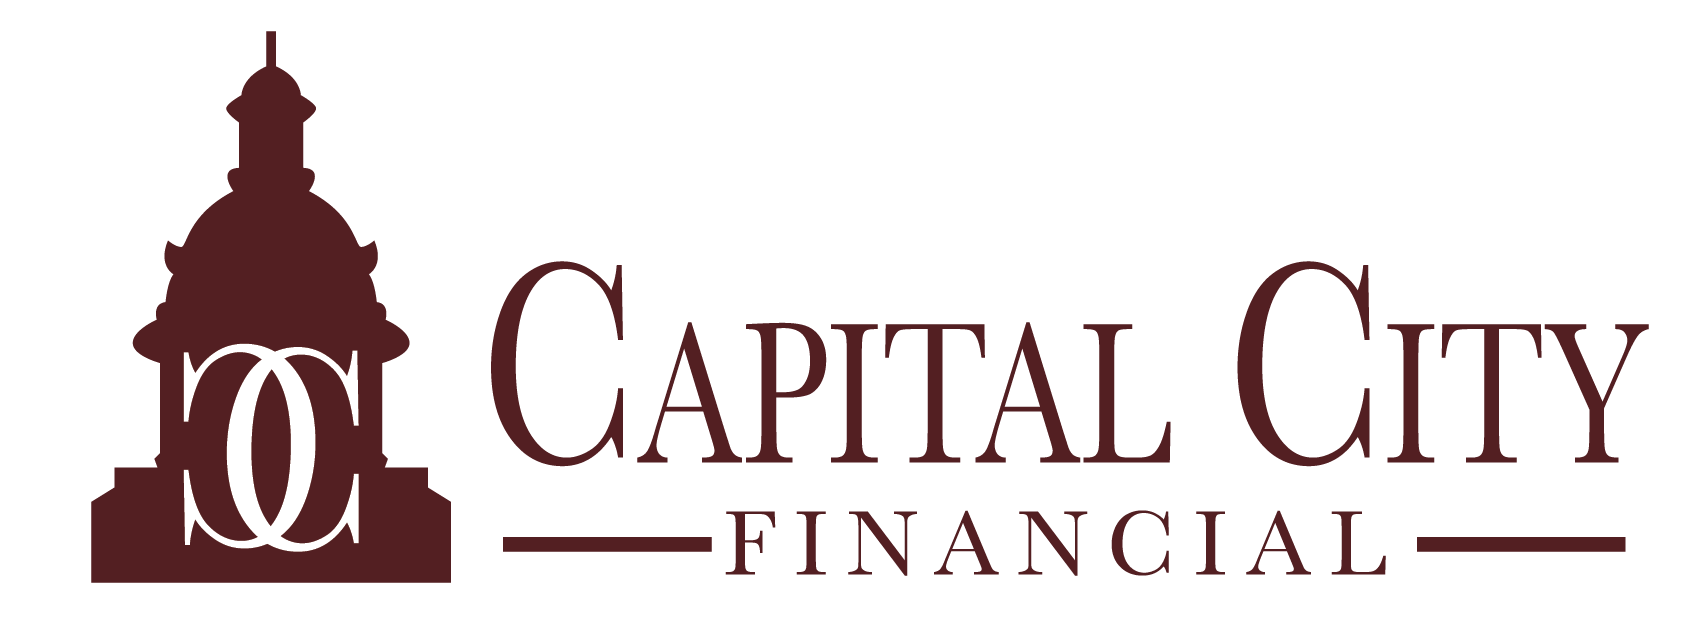 https://ccfpoffers.com/wp-content/uploads/sites/30/2020/12/3_0_Capital-City-Financial-Partners_Logo_color_ke-01-1.png